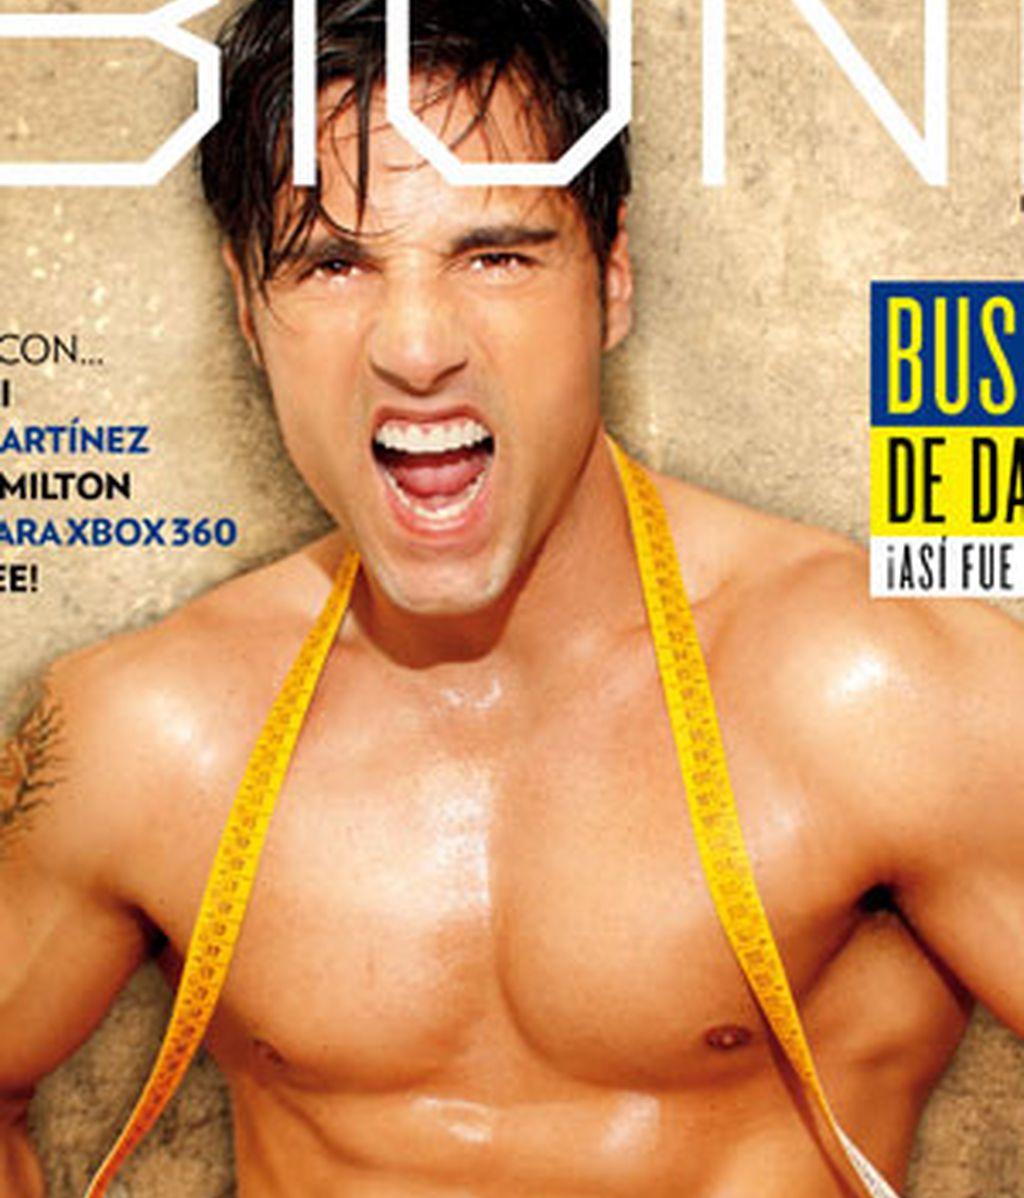 David Bustamante (metrosexual)